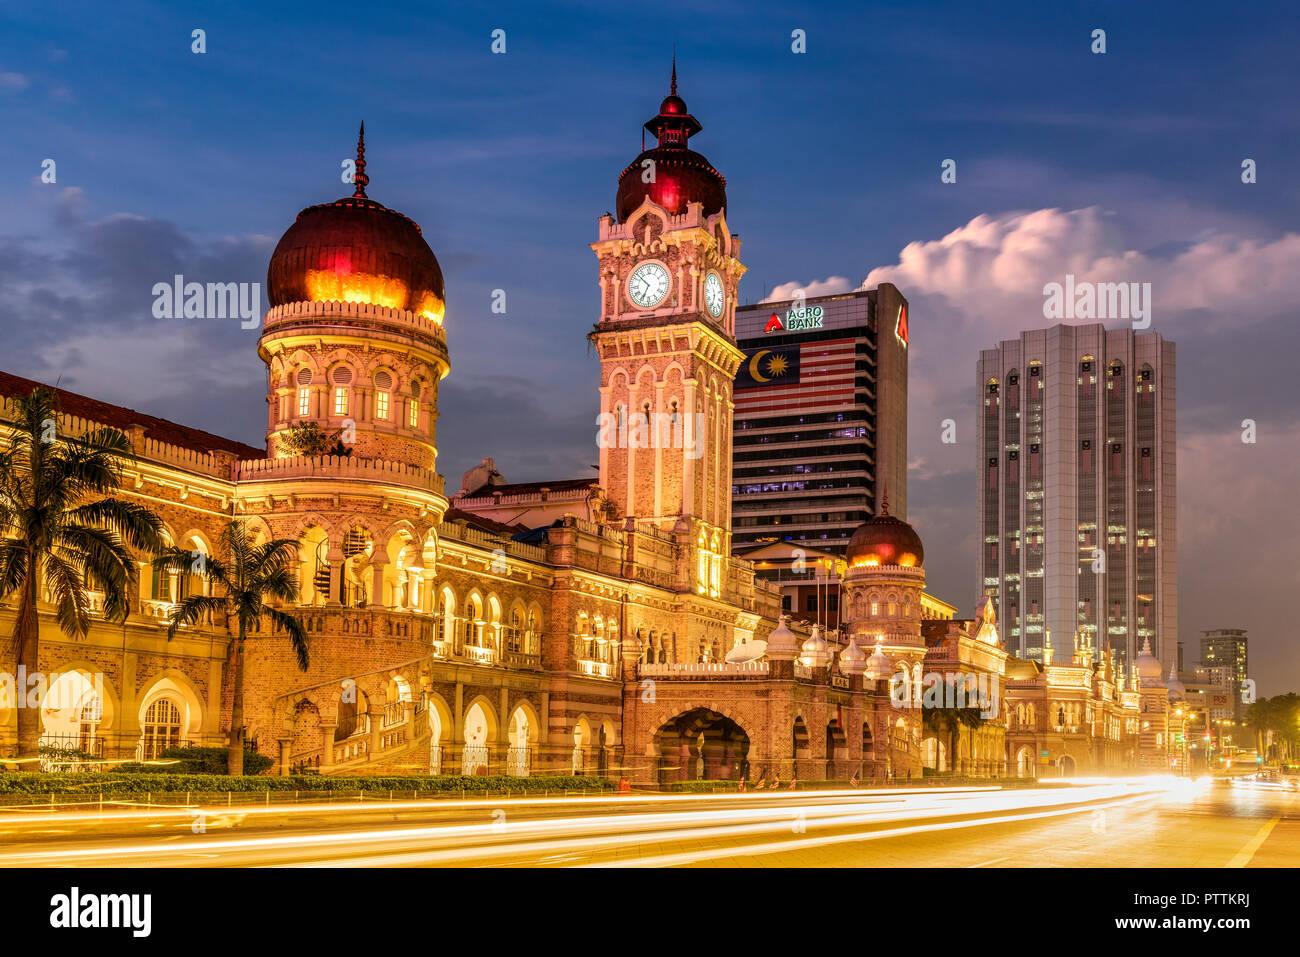 Sultan Abdul Samad Building, Merdeka Square, Kuala Lumpur, Malaysia - Stock Image